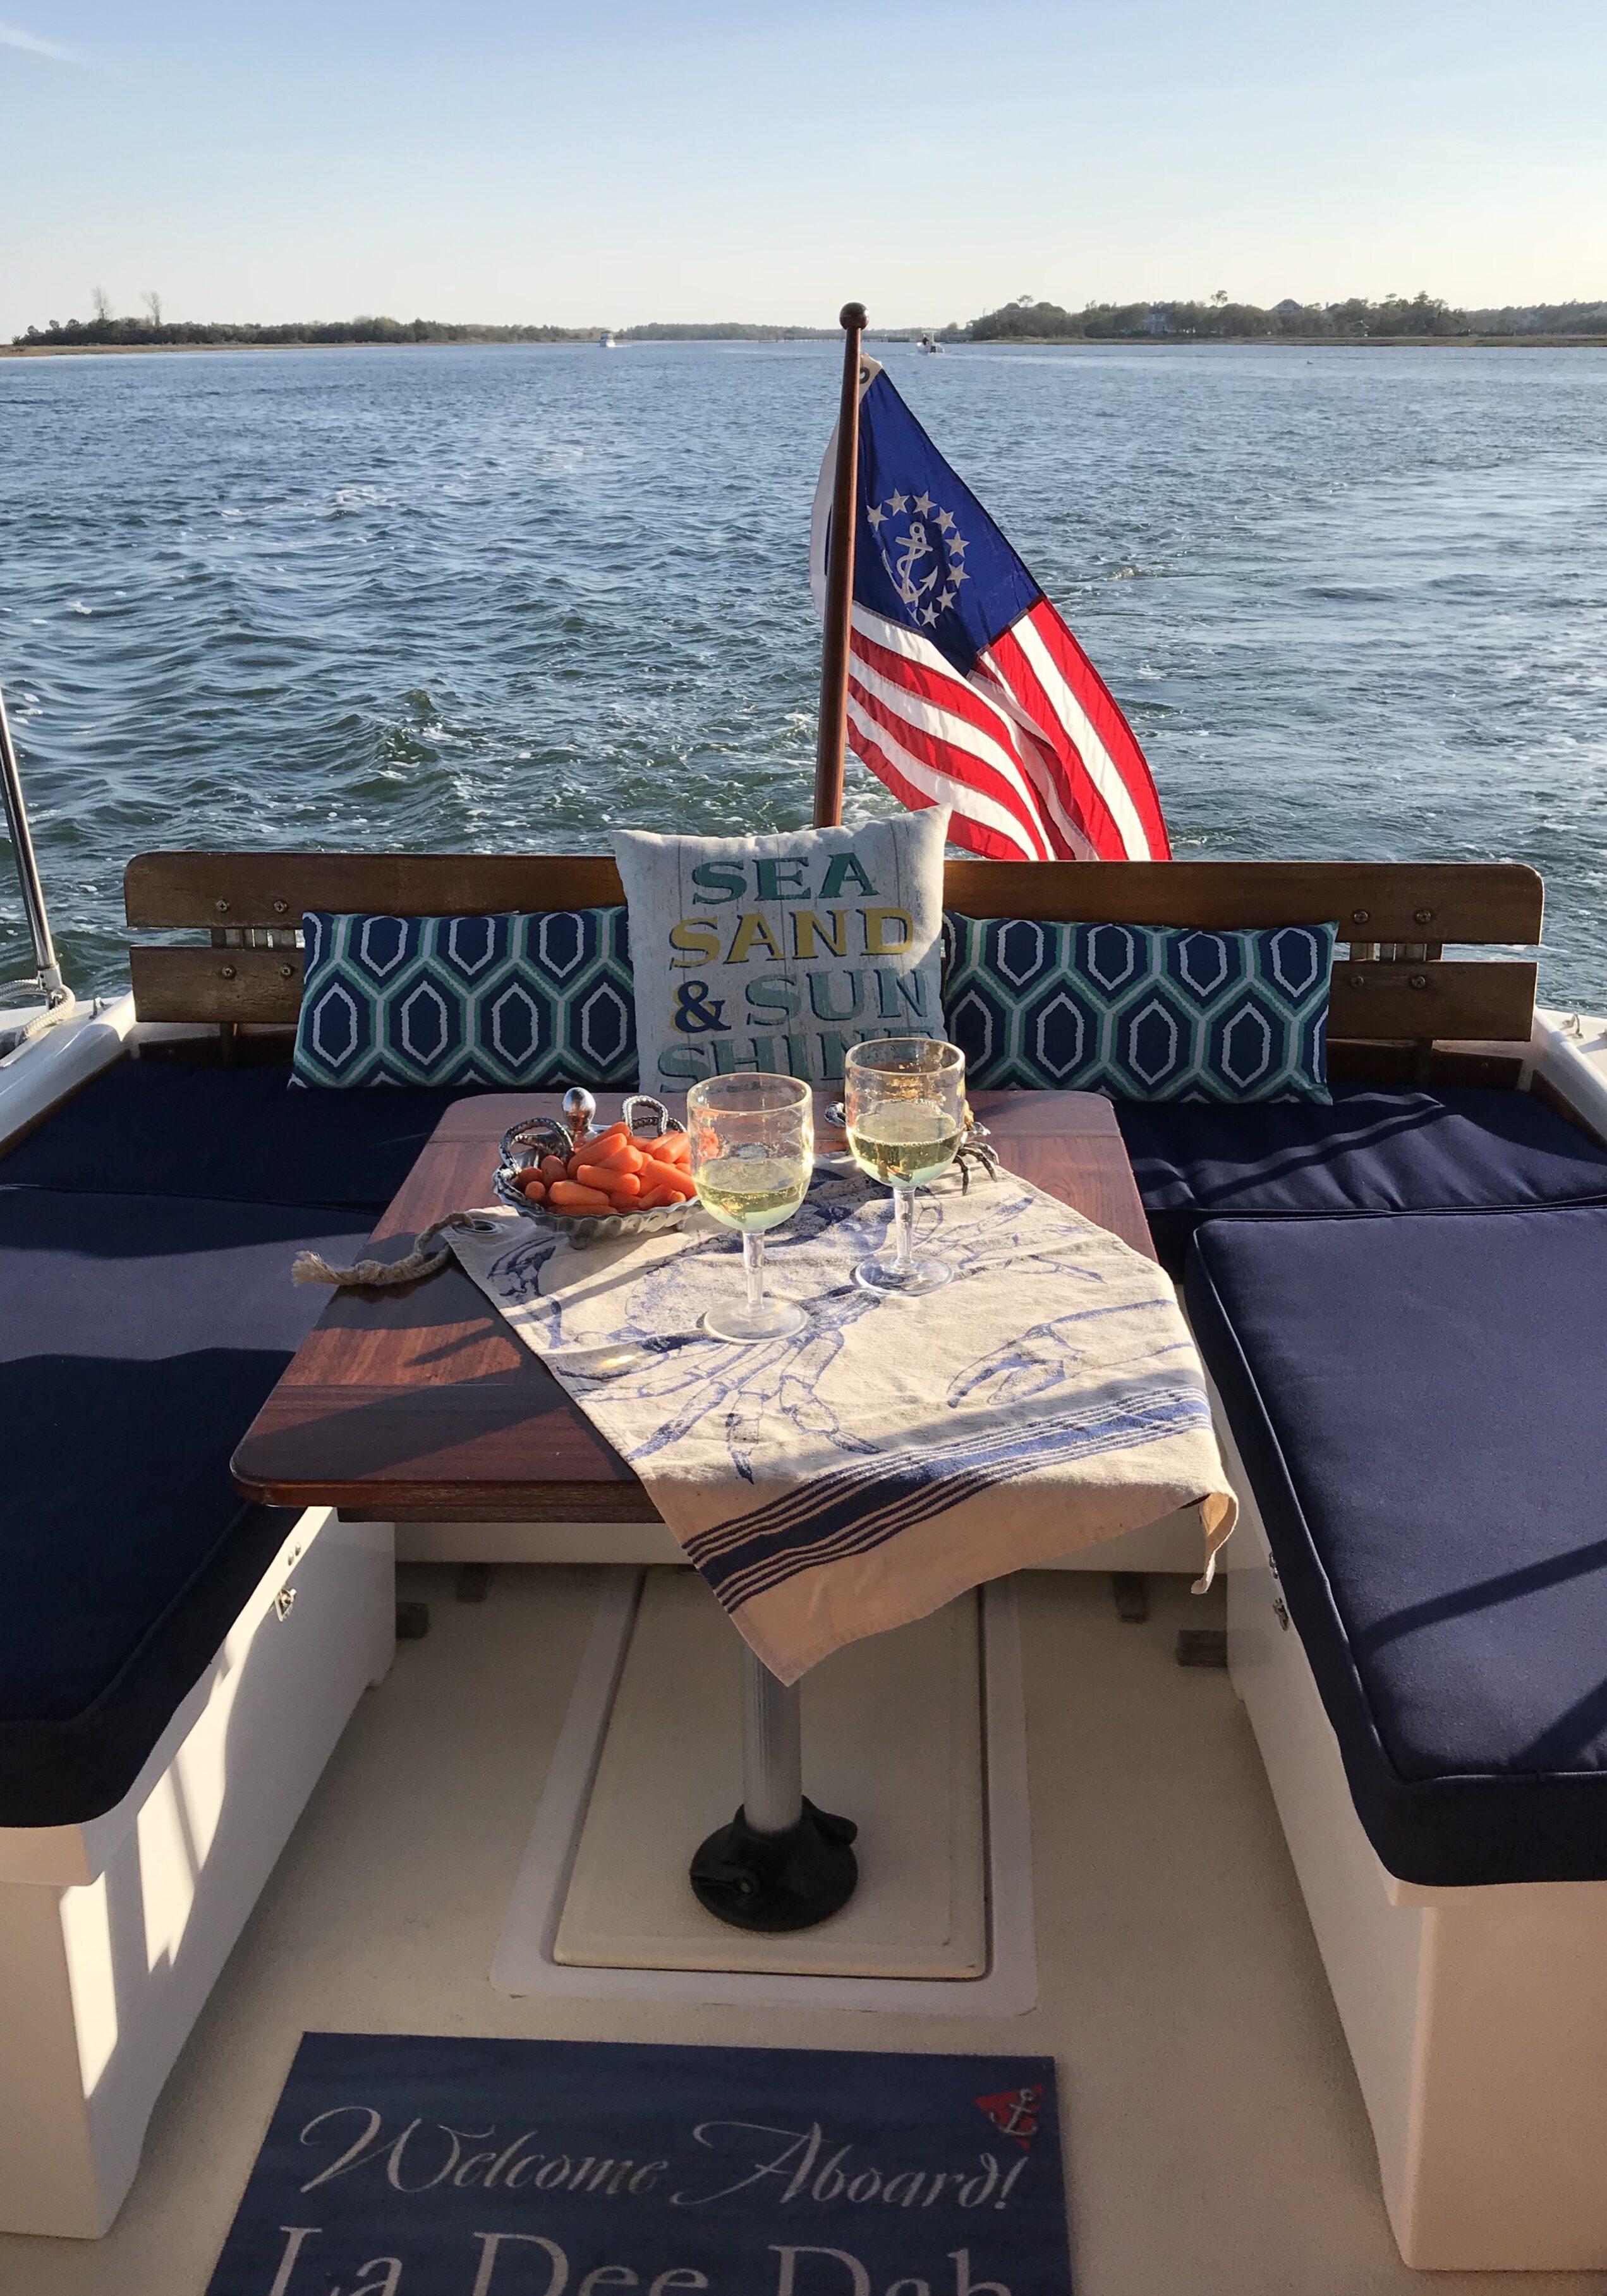 La Dee Dah Sunset Crusises Boat